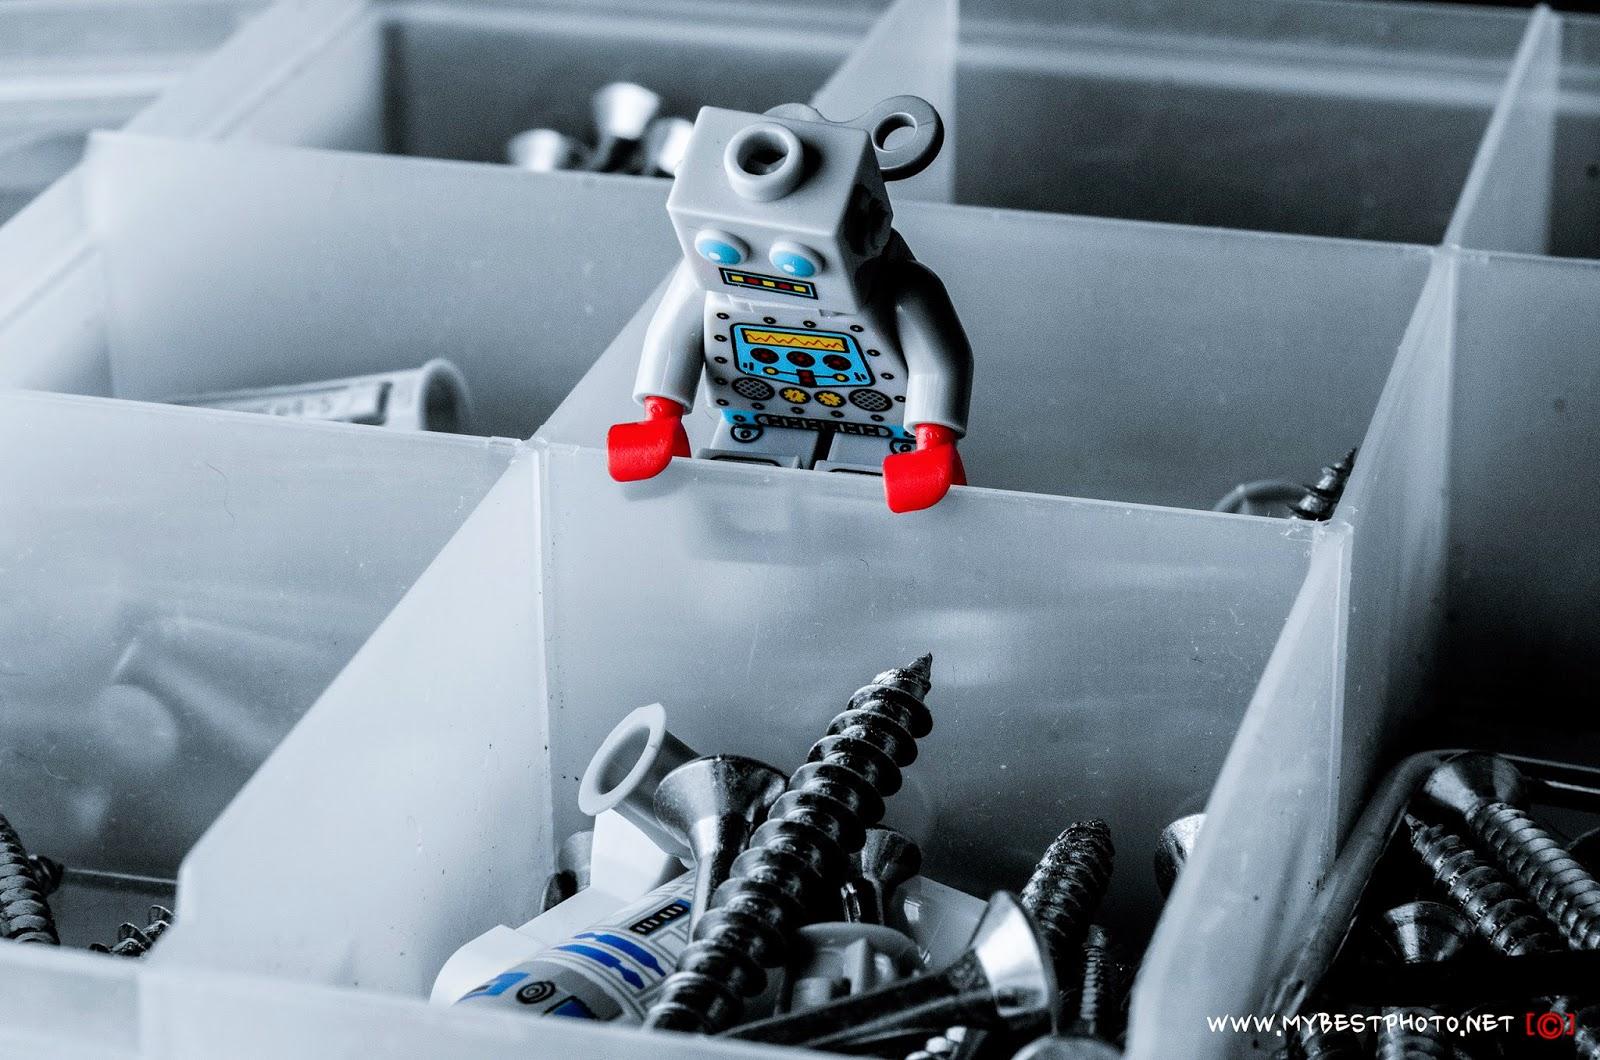 Lego Minifigure Series 6 Clockwork Robot - Wallpaper